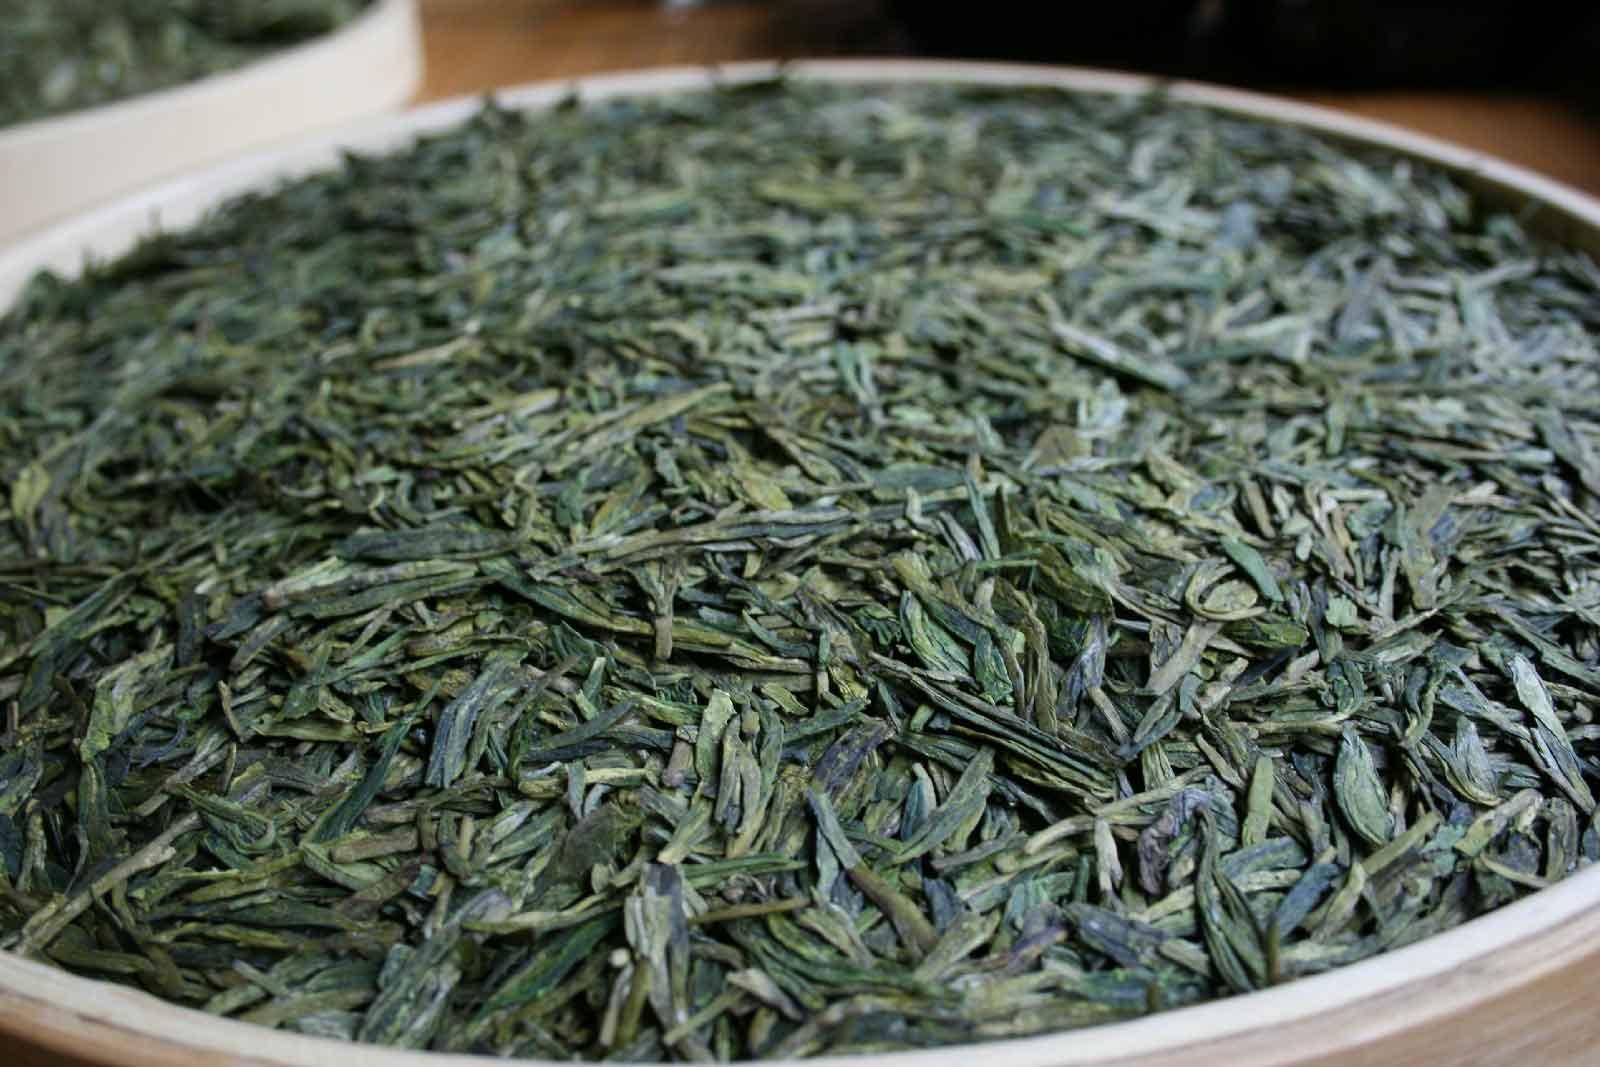 Dragon Well Tea Leaves After Firing